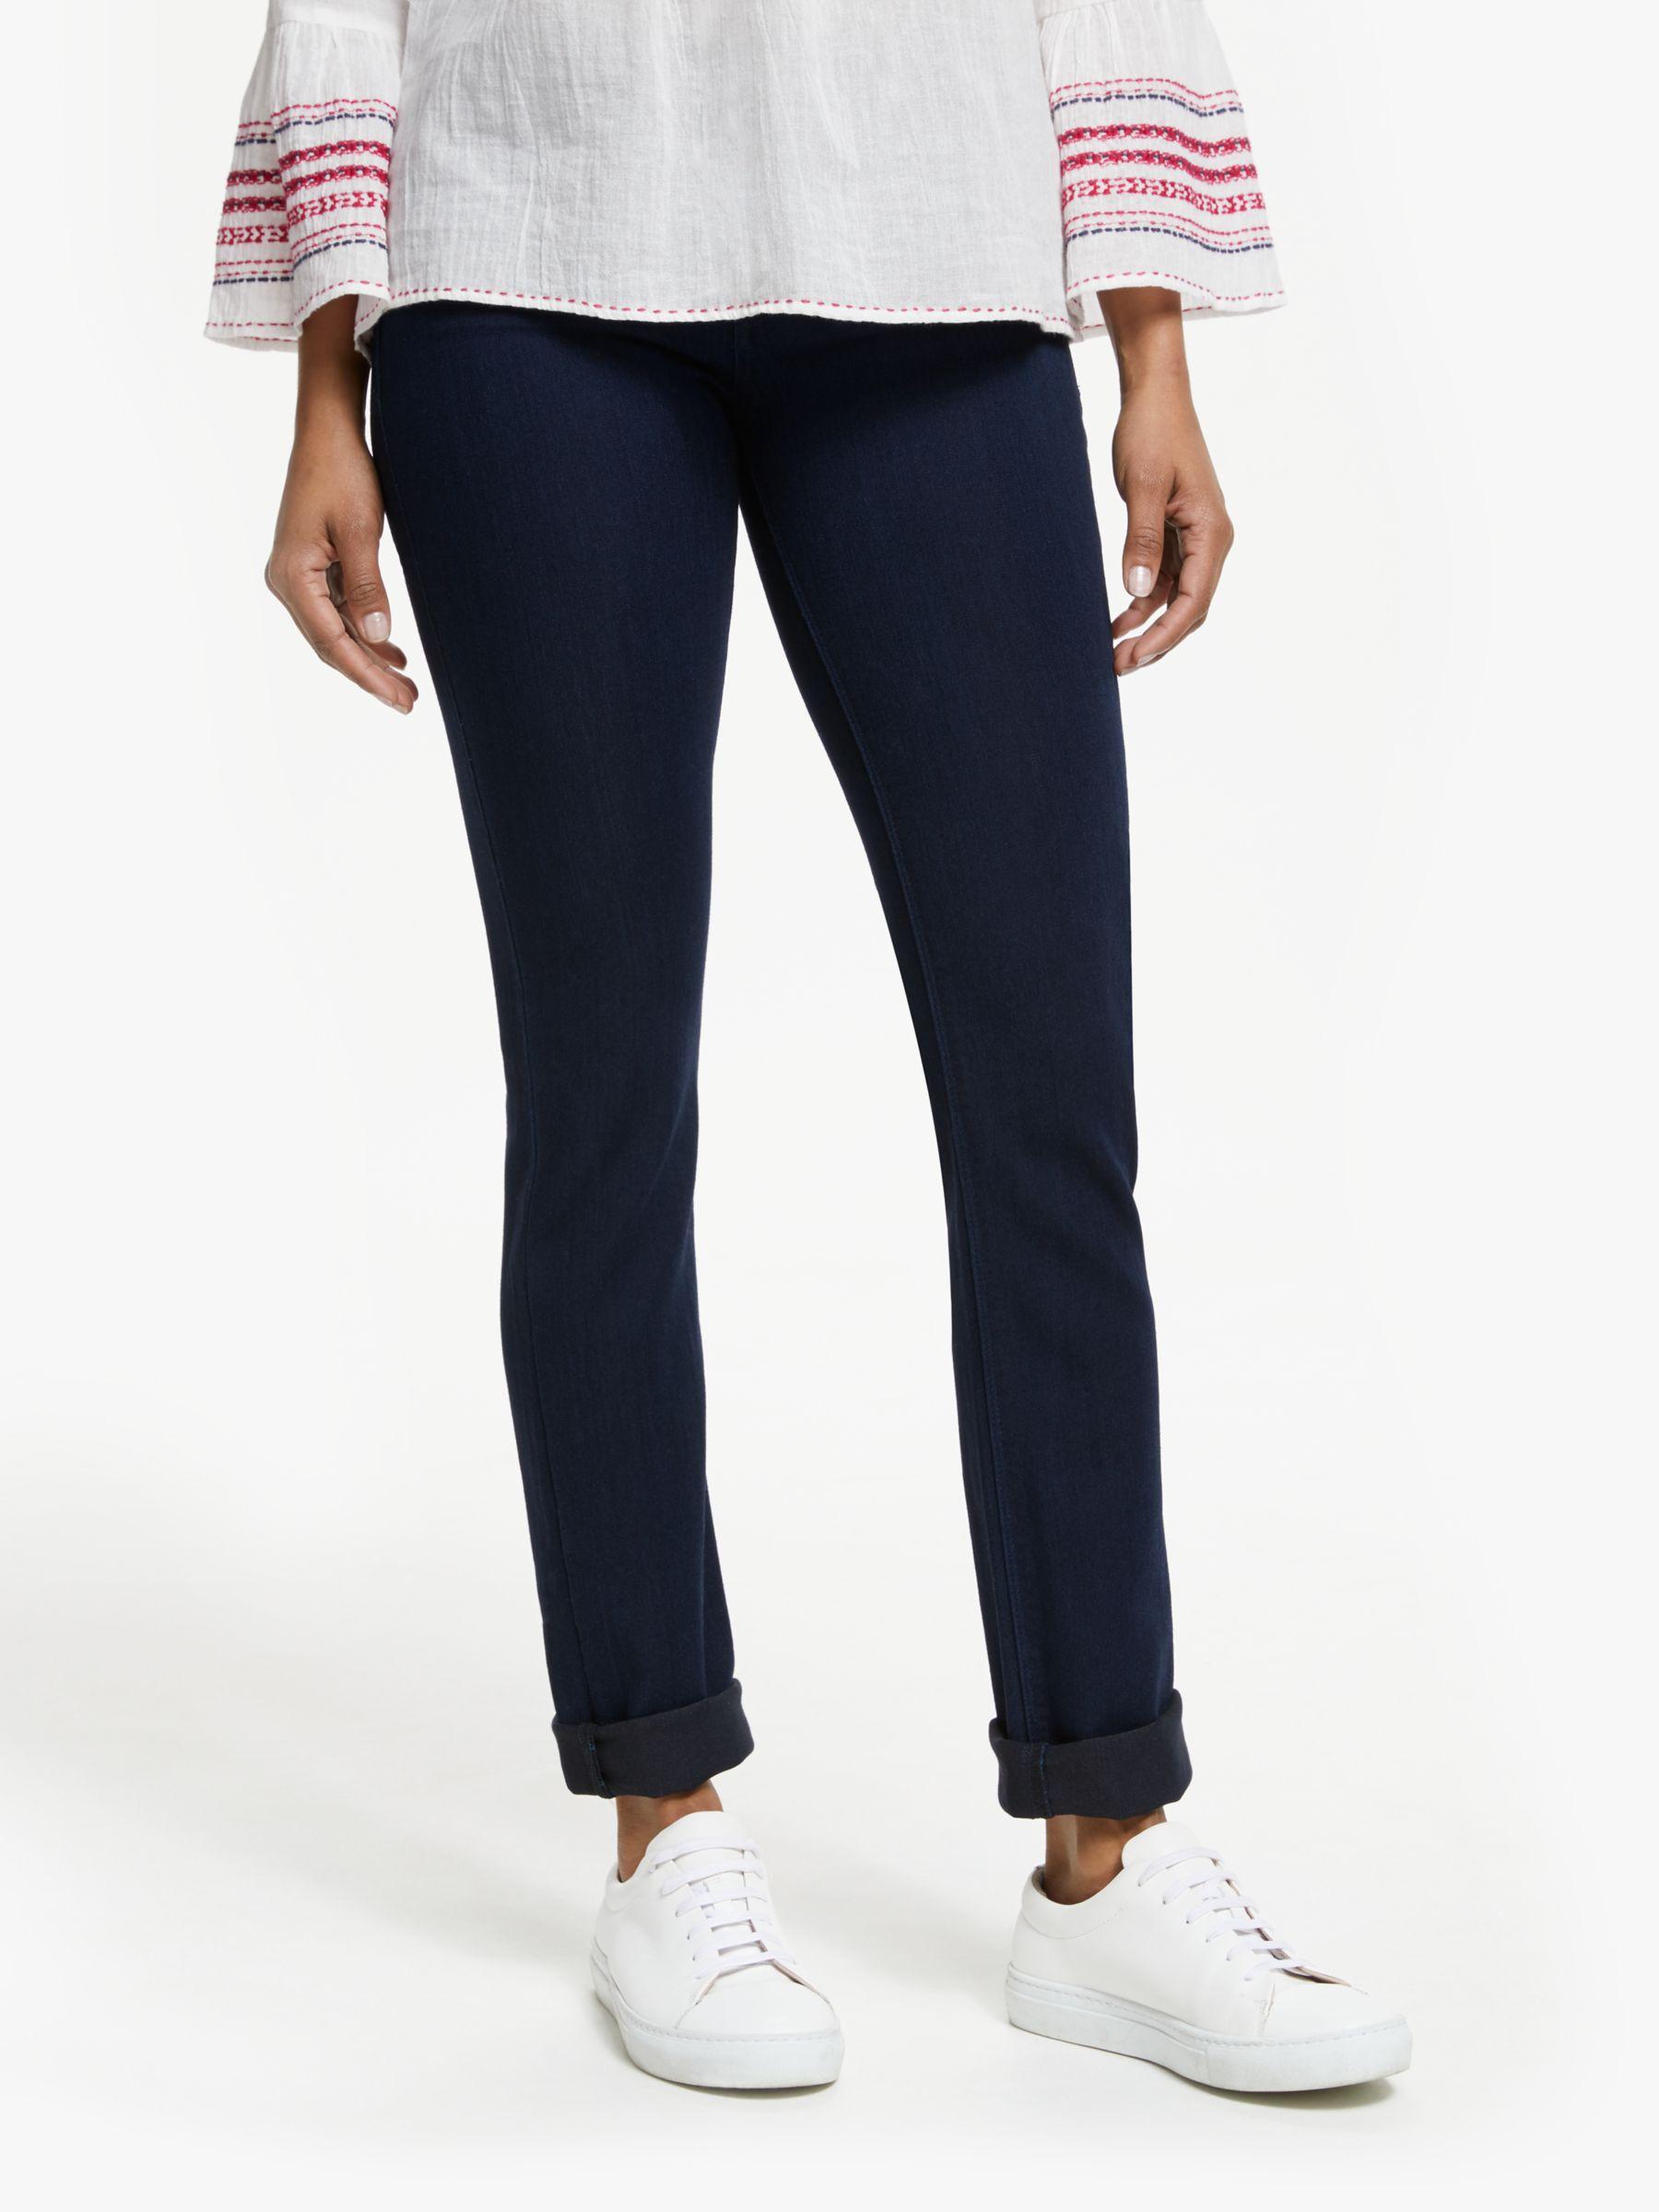 DL1961 DL1961 Coco Curvy Straight Leg Jeans, Flat Iron